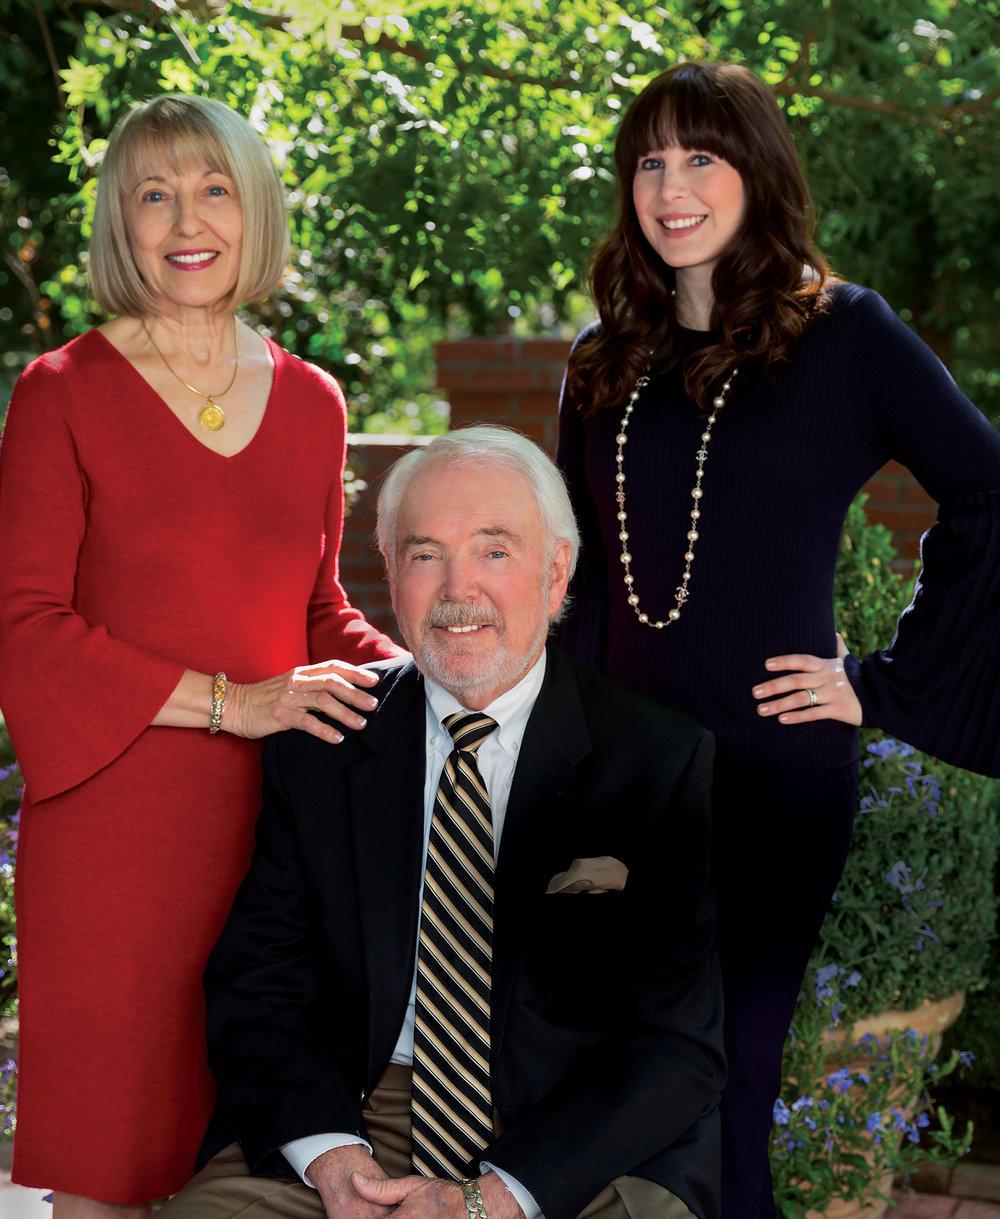 Tom Hyatt, Angie Hyatt, & Ashley Hyatt - Clients always come first.